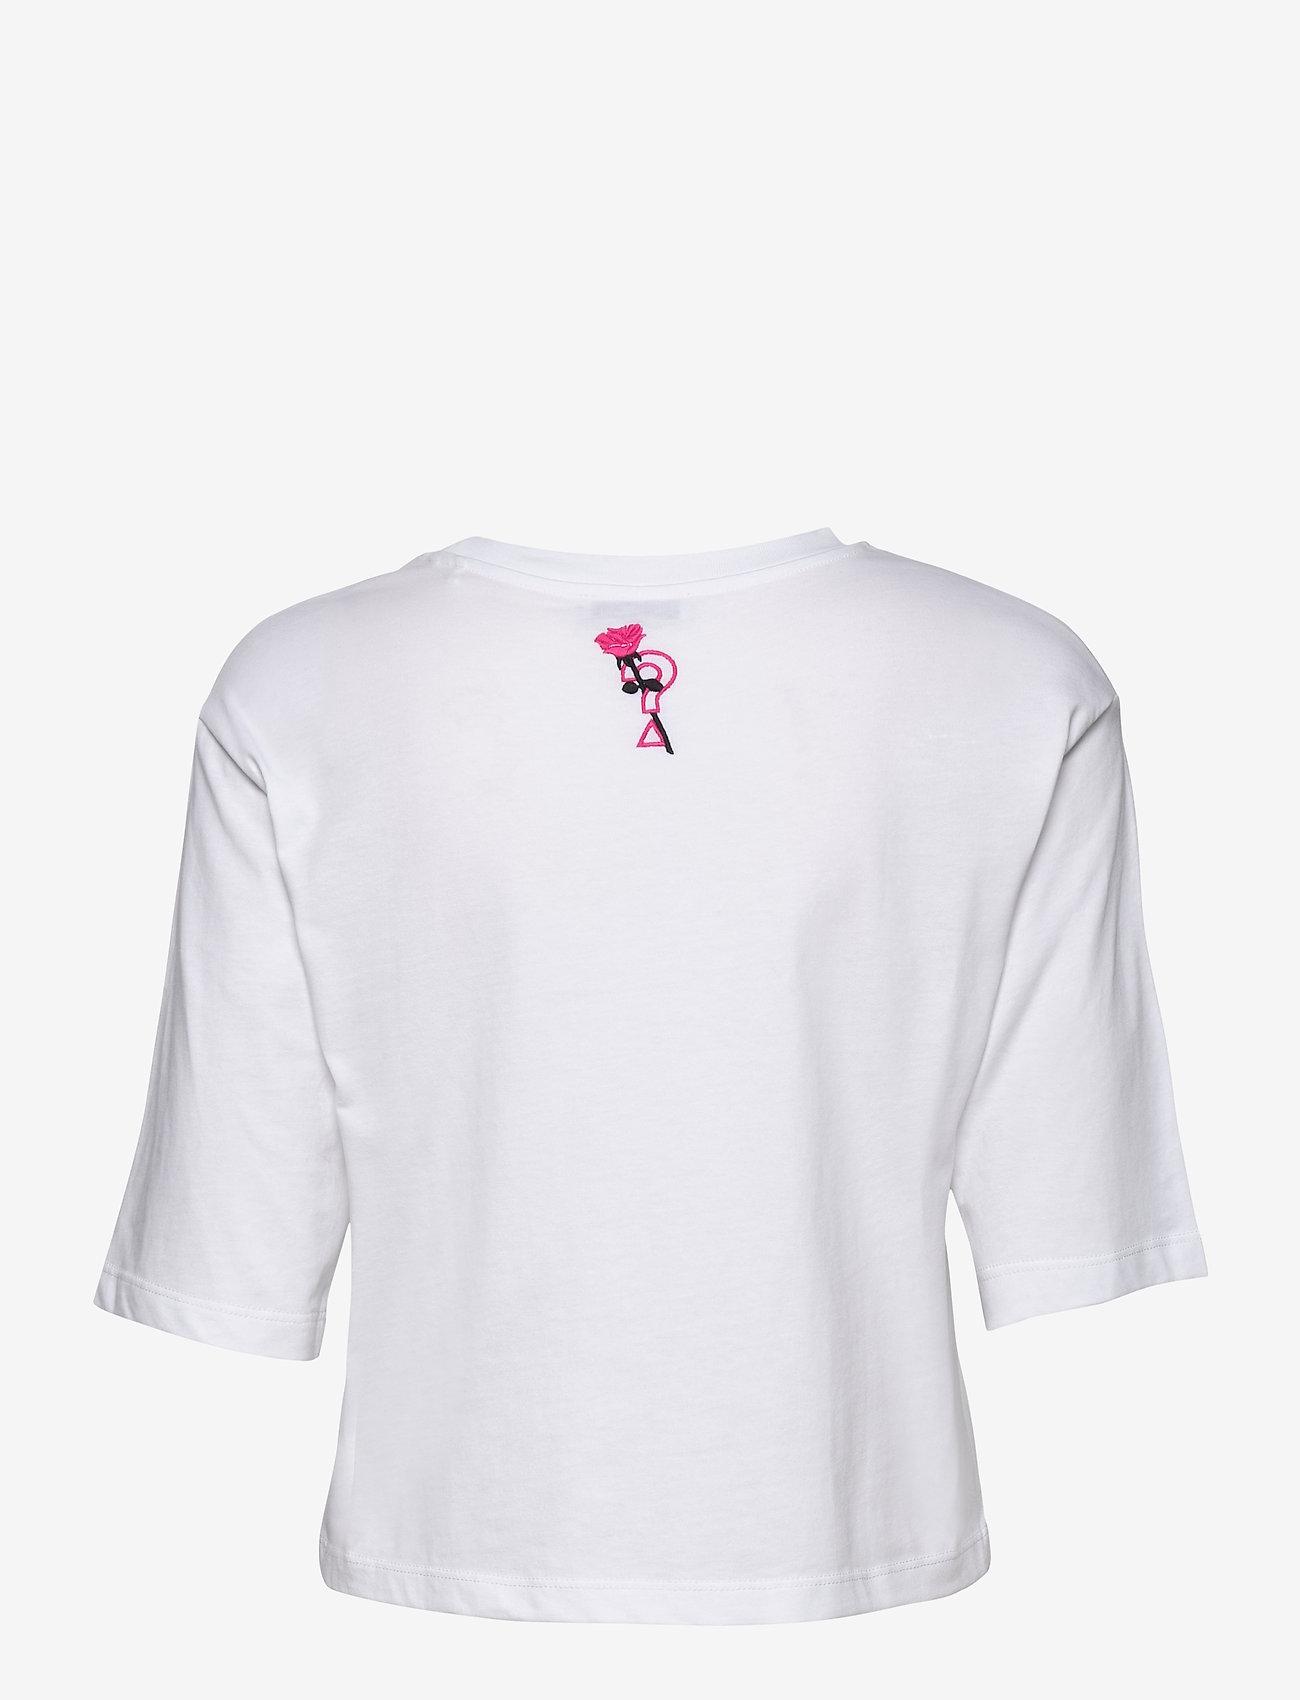 GUESS Jeans SS CN KENDRA TEE - T-shirts & topper TRUE WHITE A000 - Dameklær Spesialtilbud